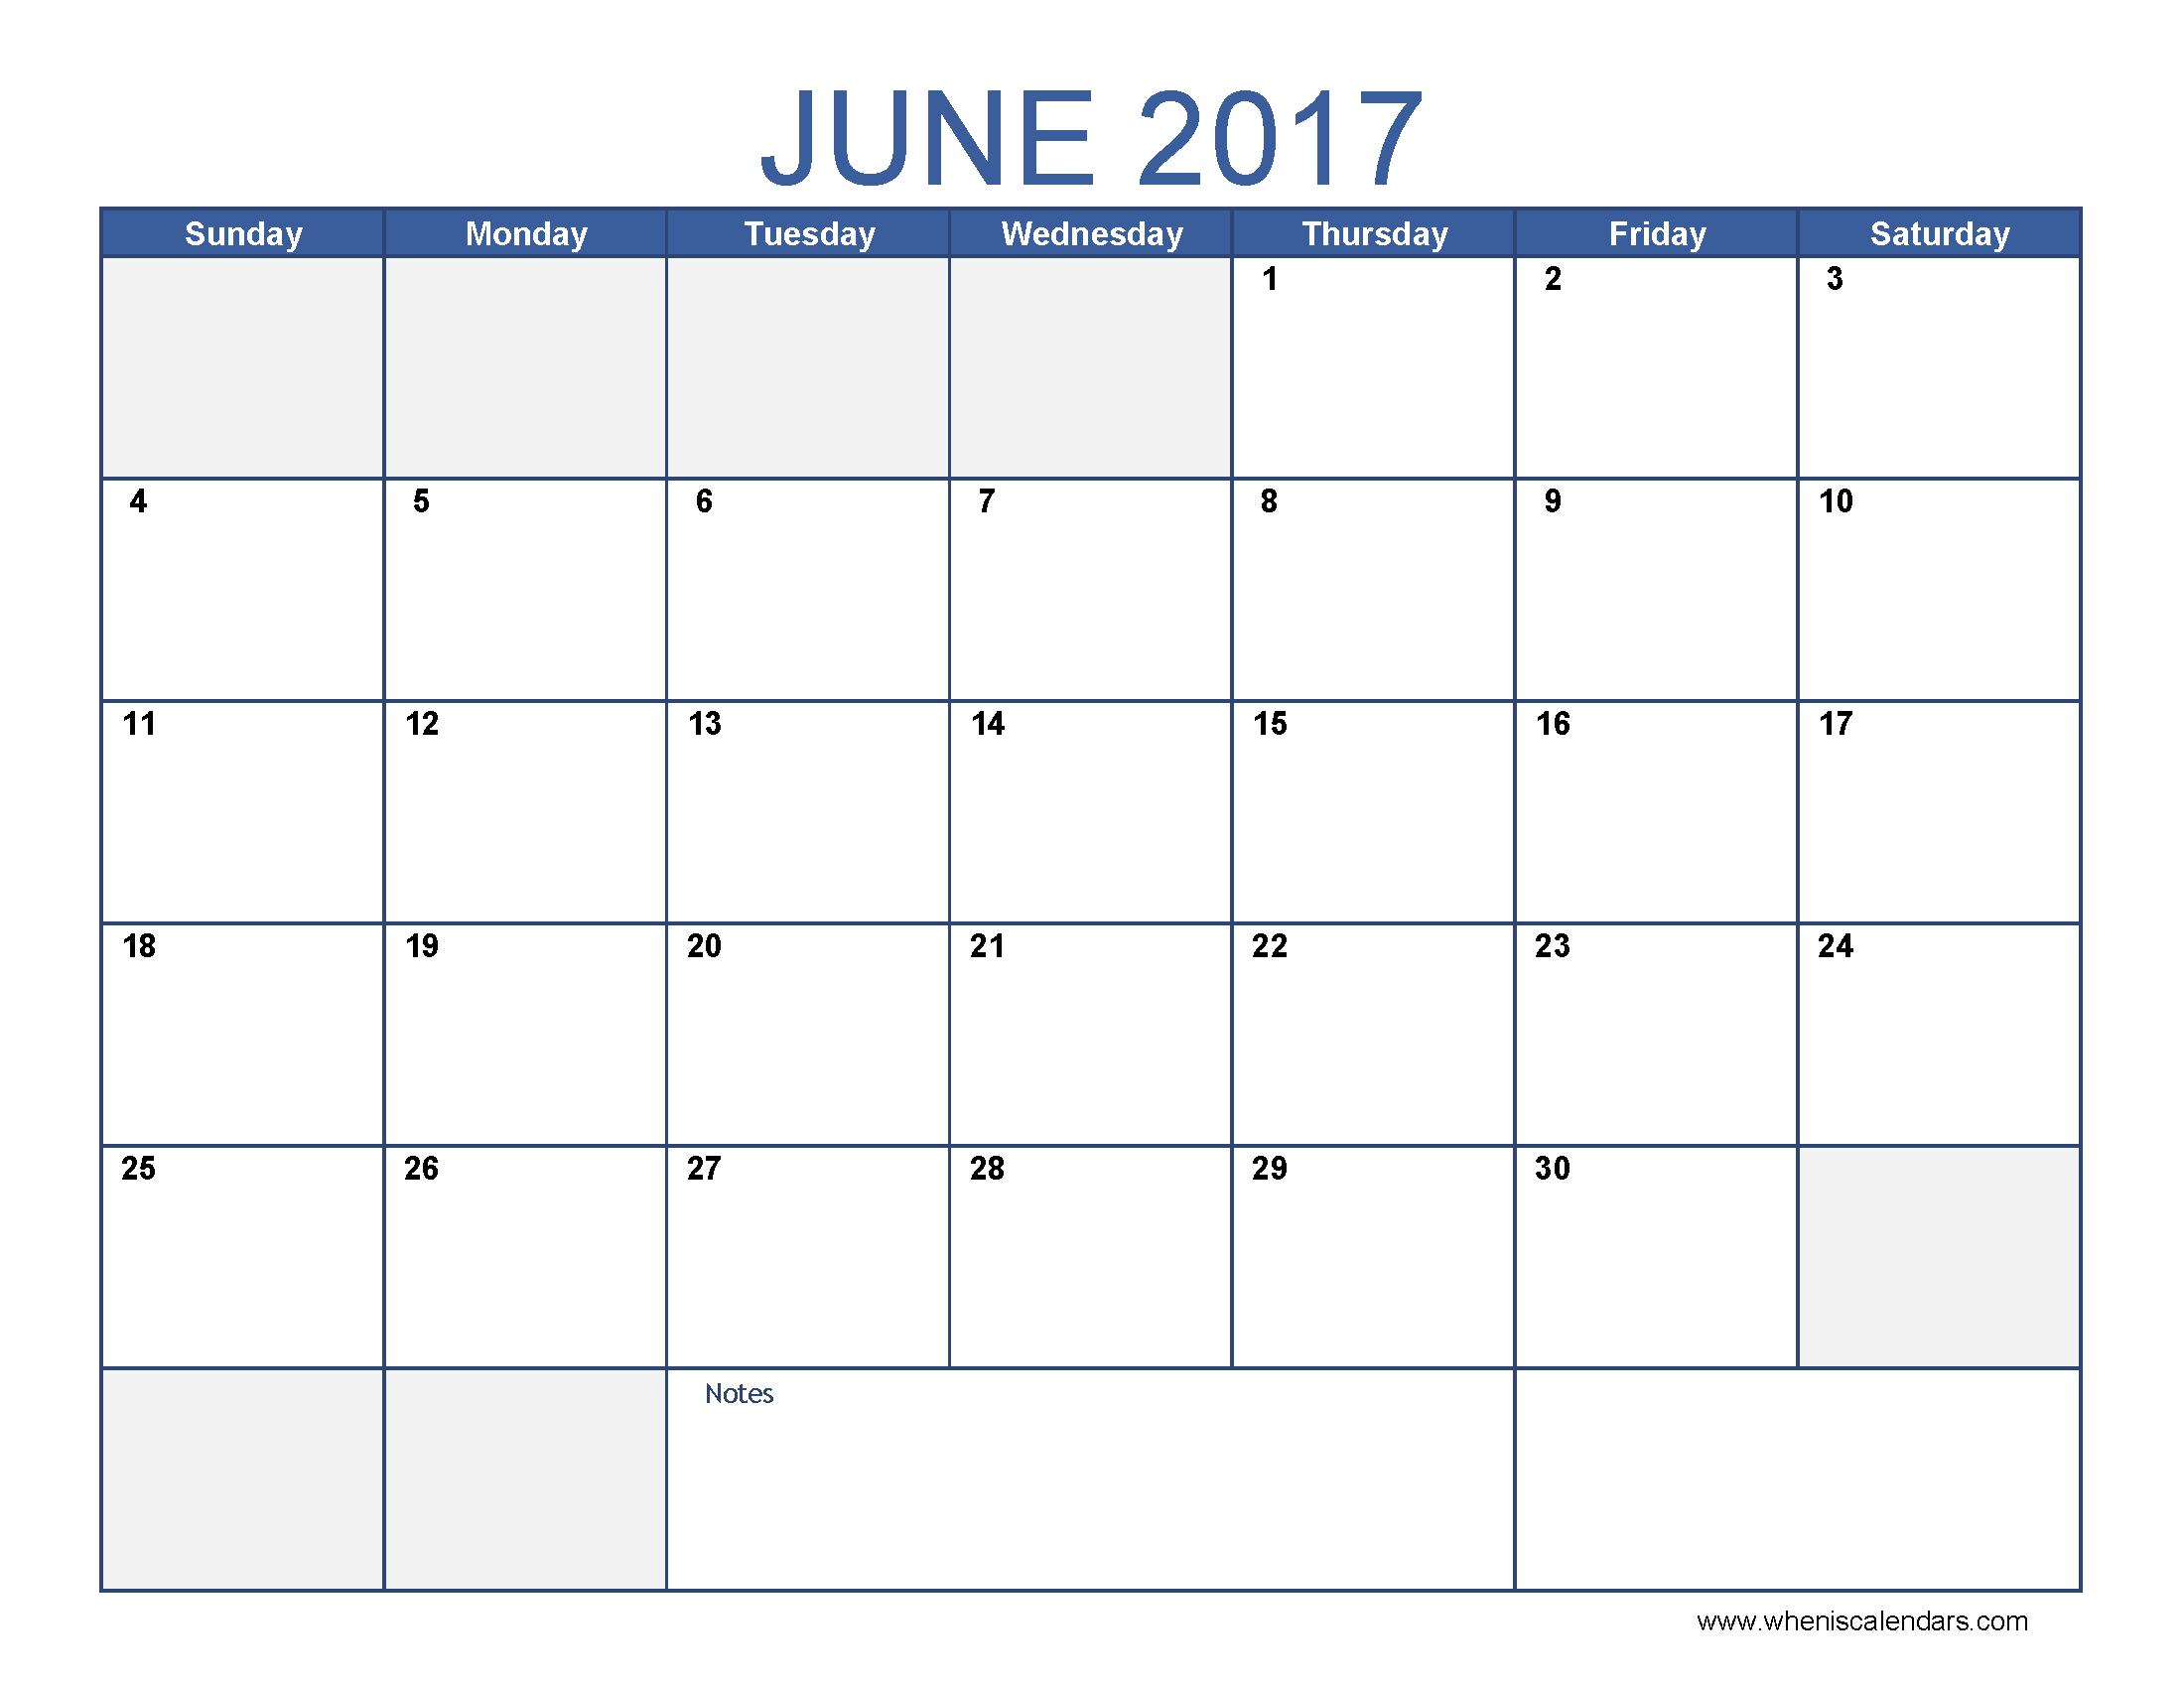 June 2017 Calendar Template | free calendar 2017